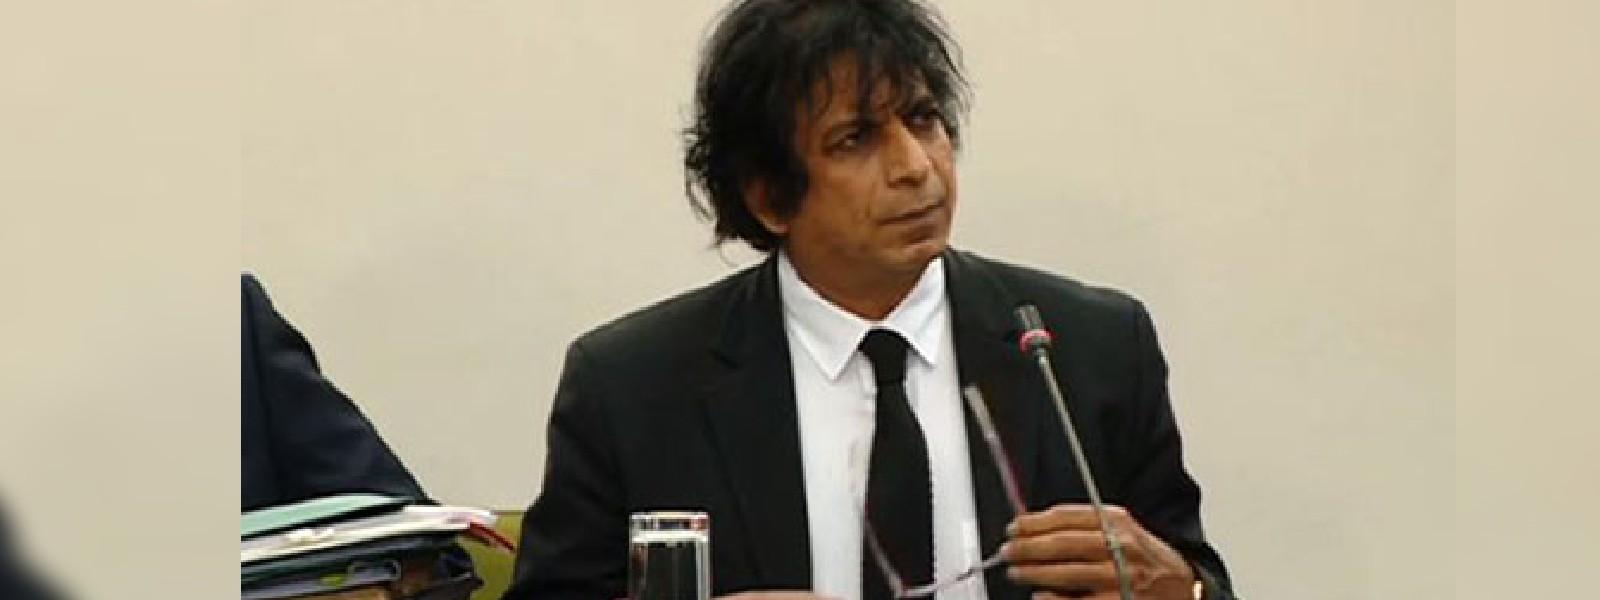 Produce Hejaaz in court, AG tells IGP